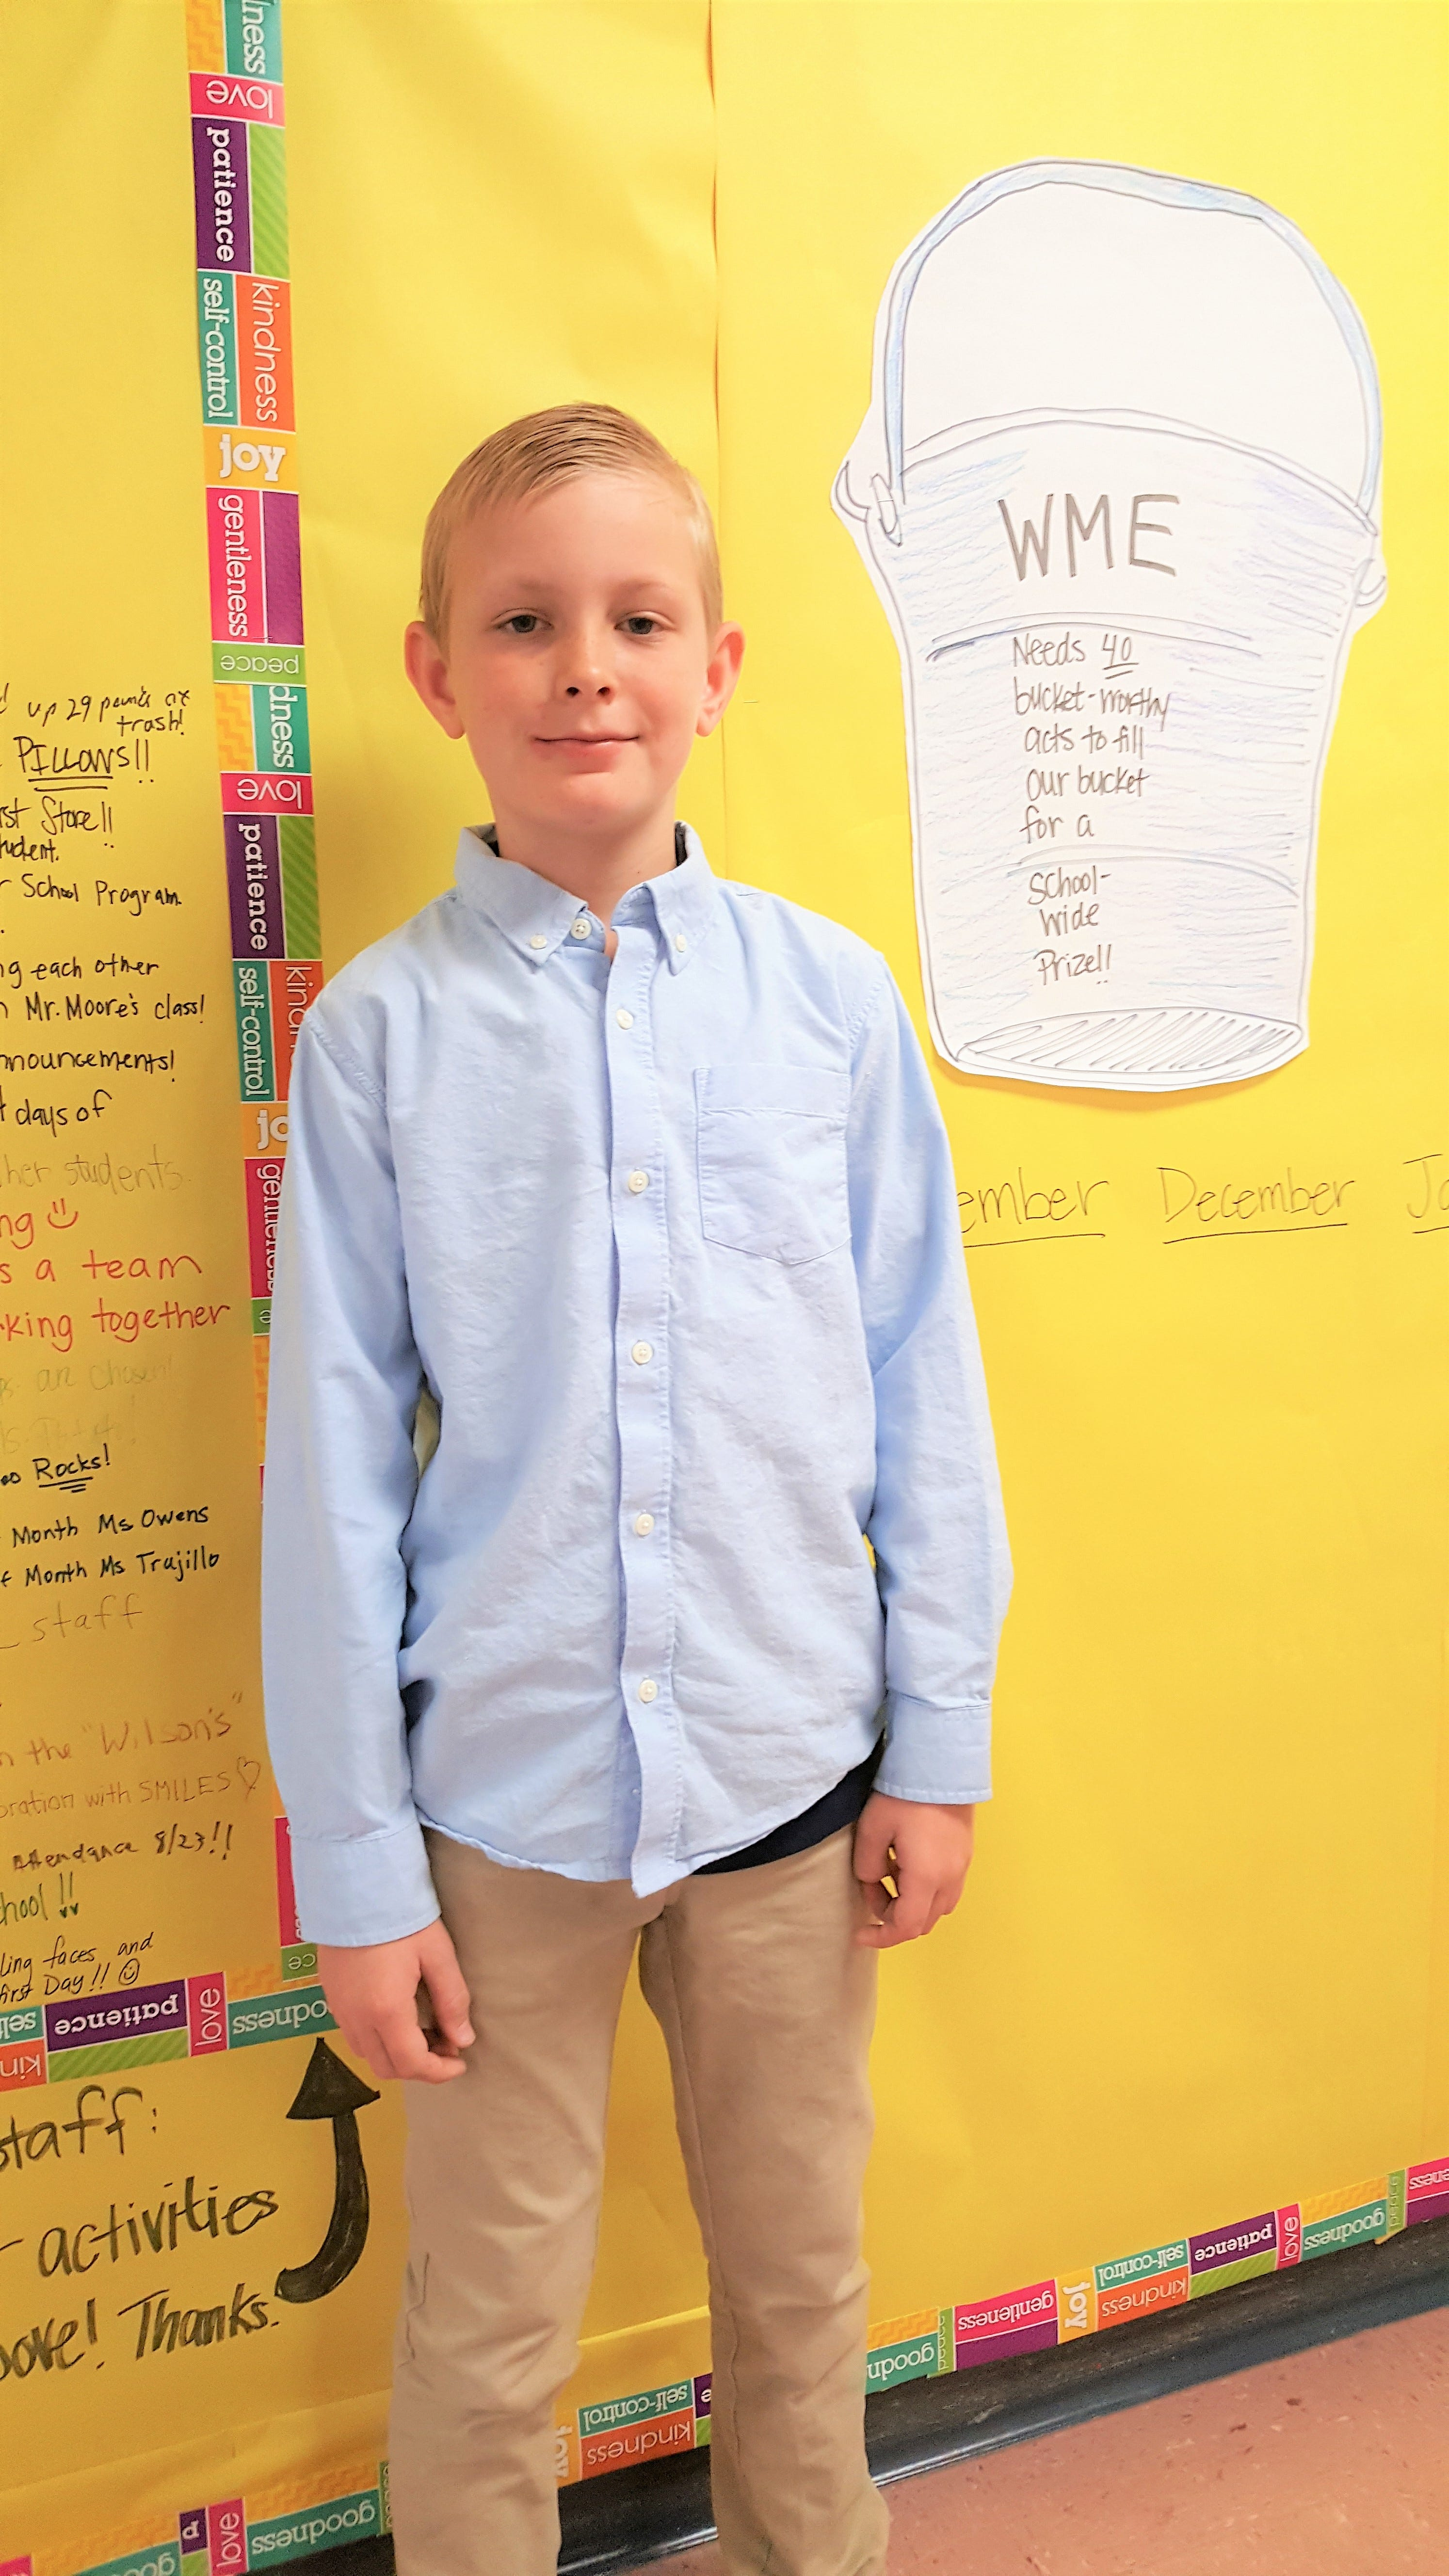 WME 4th Grader Sam McEwen In the spotlight